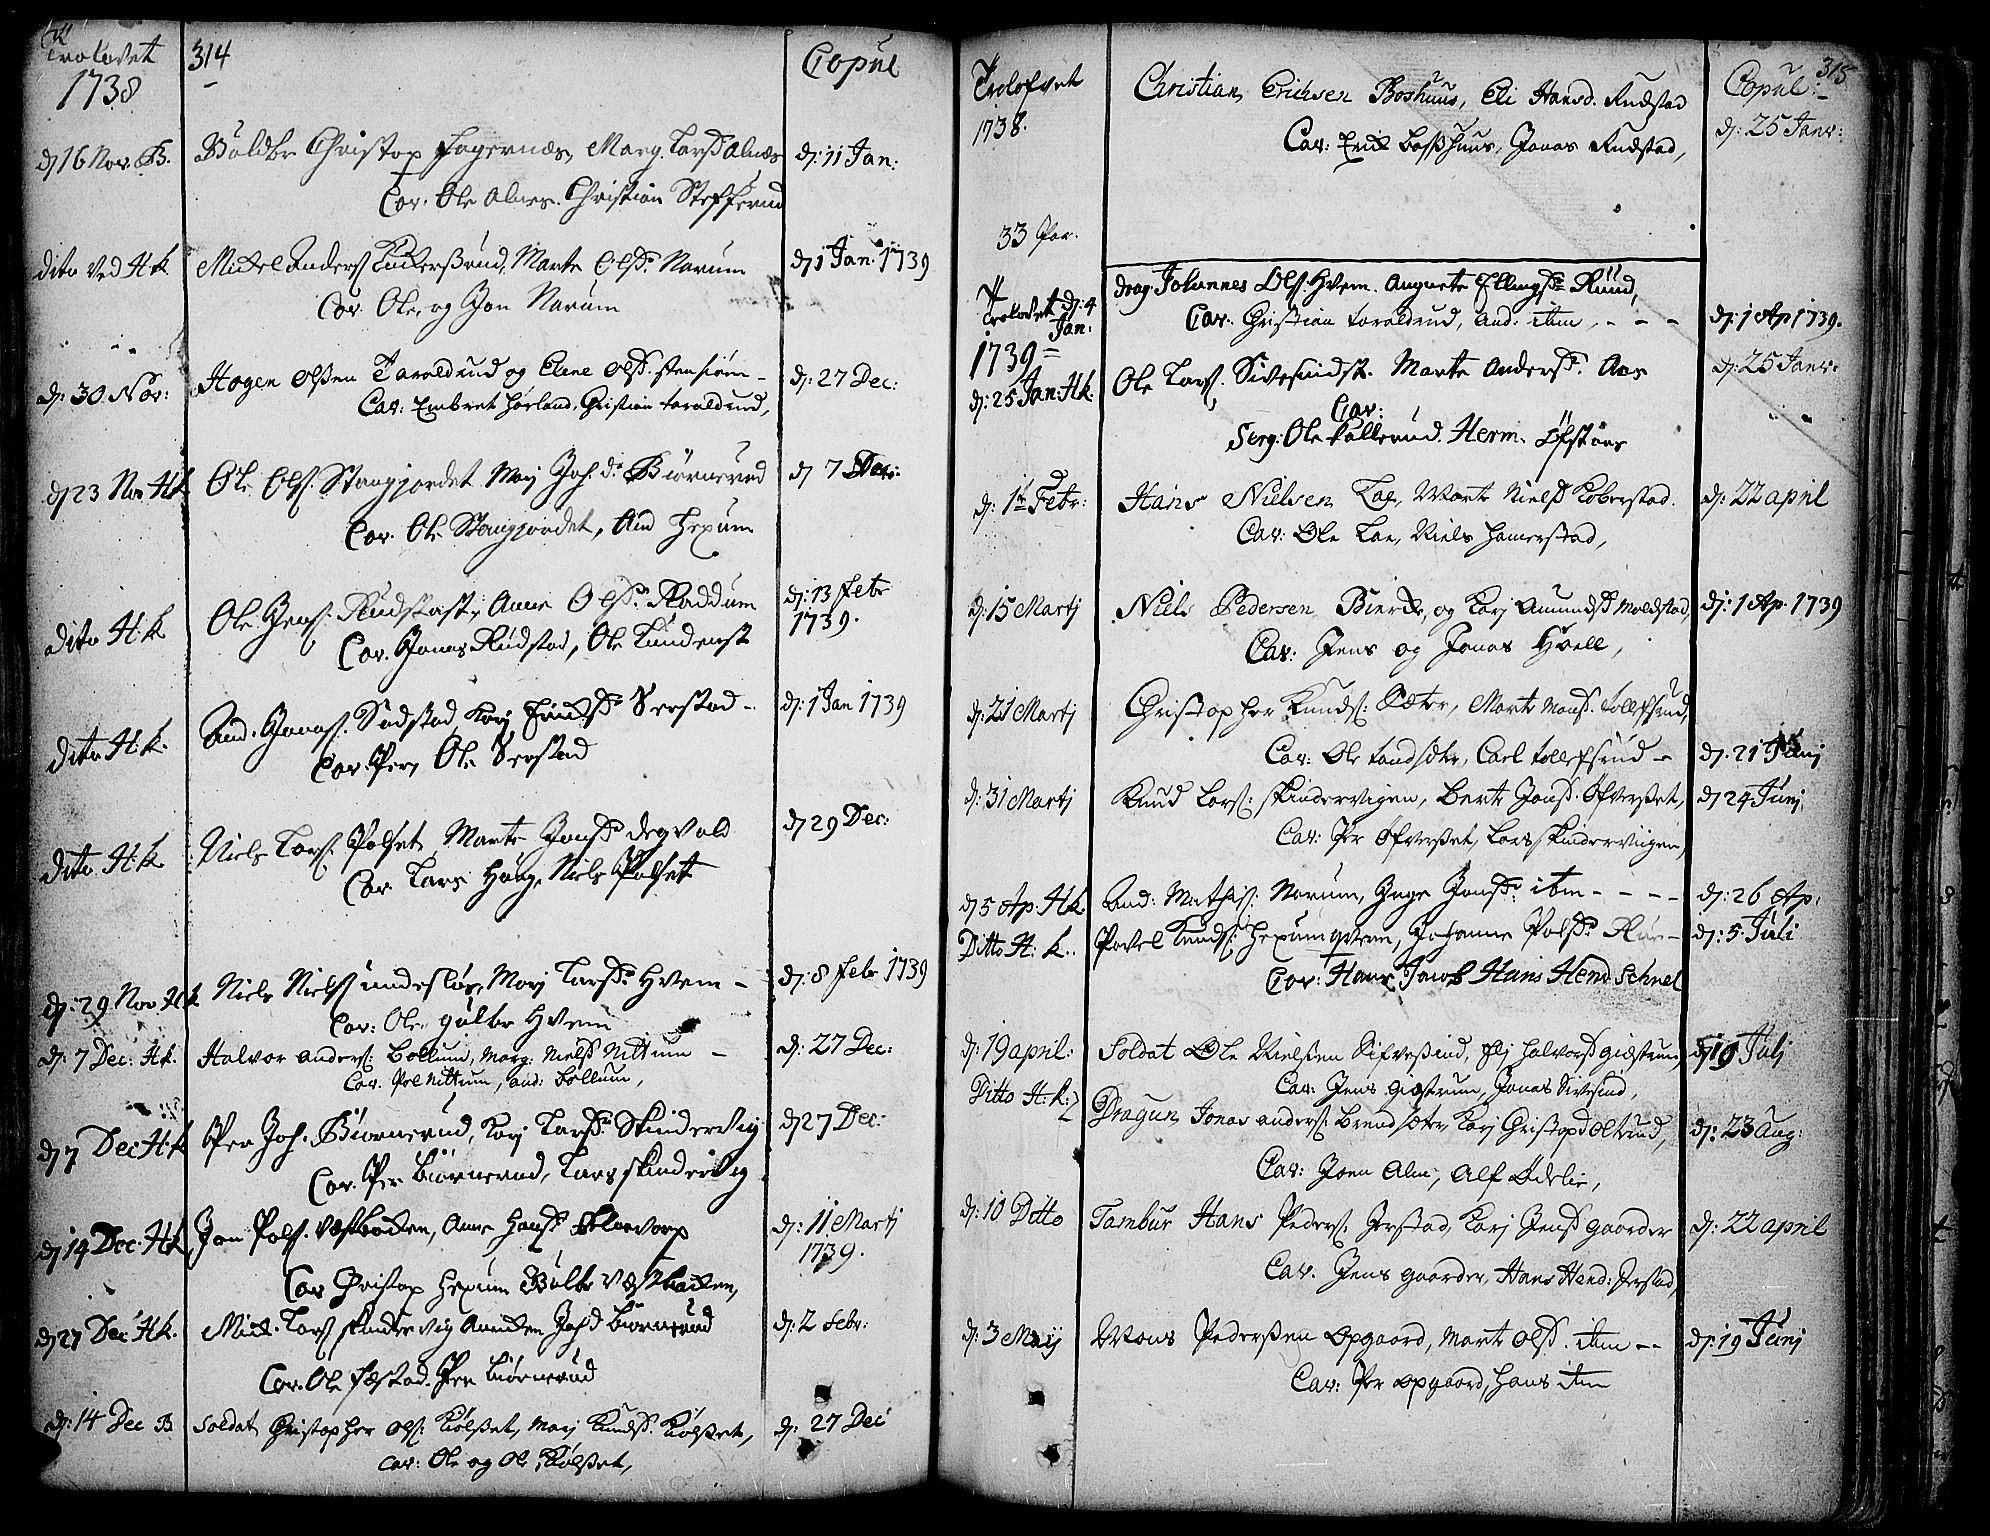 SAH, Toten prestekontor, Ministerialbok nr. 3, 1734-1751, s. 314-315